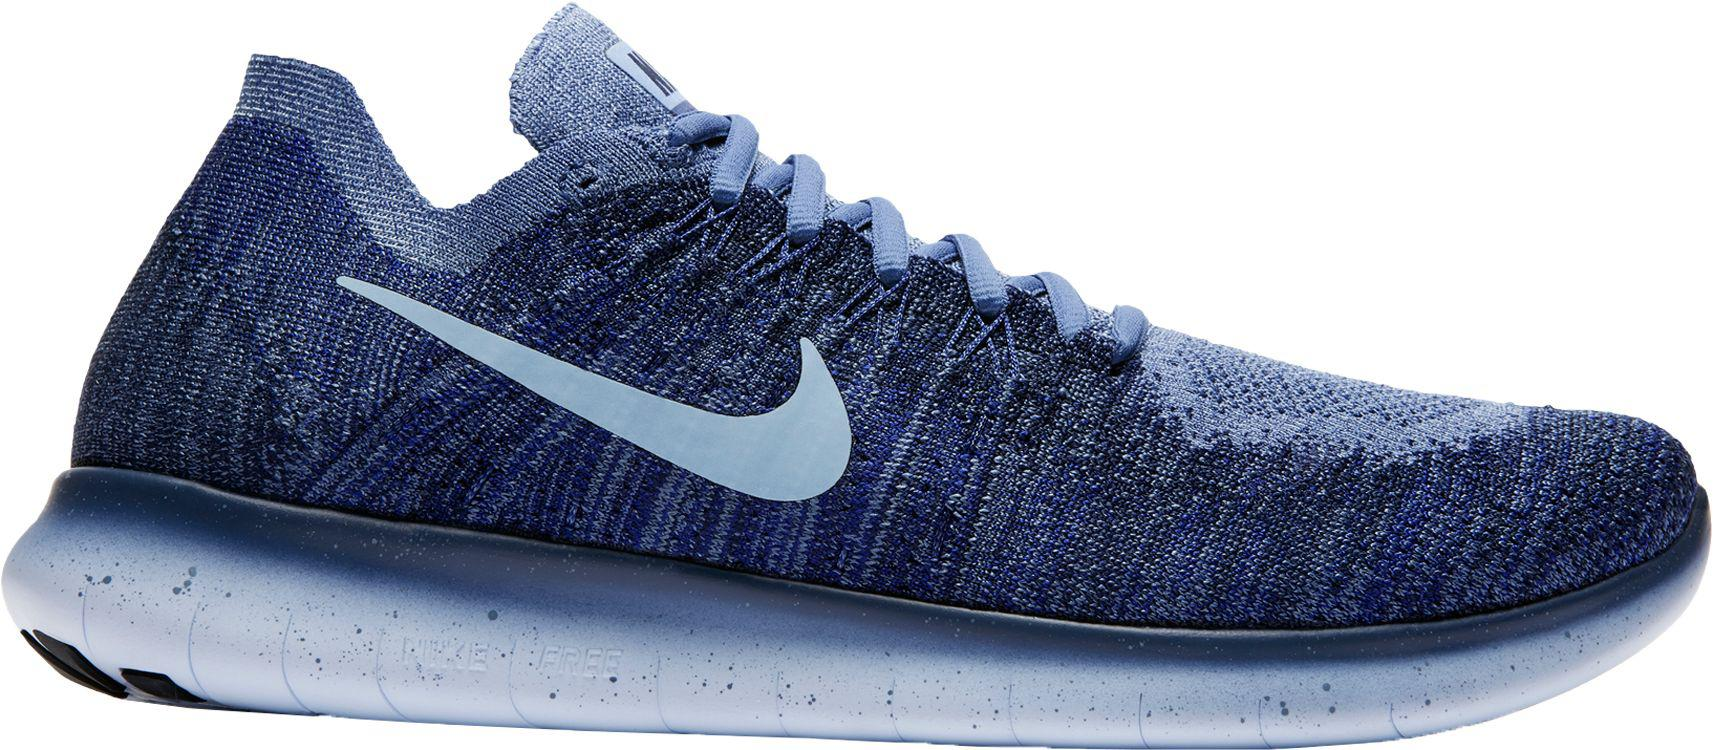 6067e7776da2 Lyst - Nike Free Rn Flyknit 2017 Running Shoes in Blue for Men